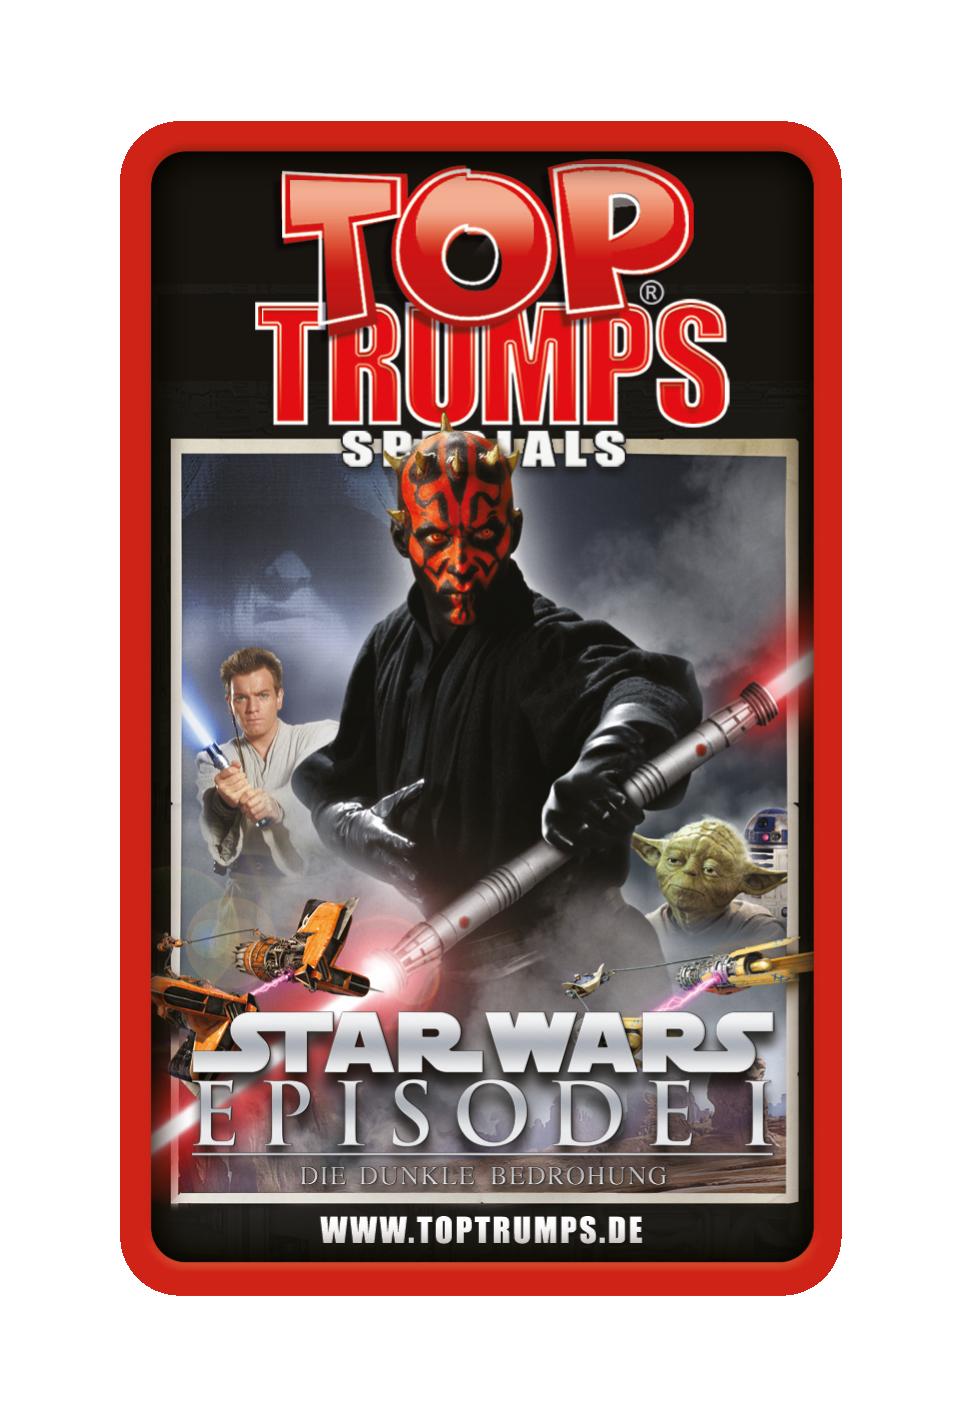 Top Trumps Star Wars Episode 1 - Die dunkle Bedrohung